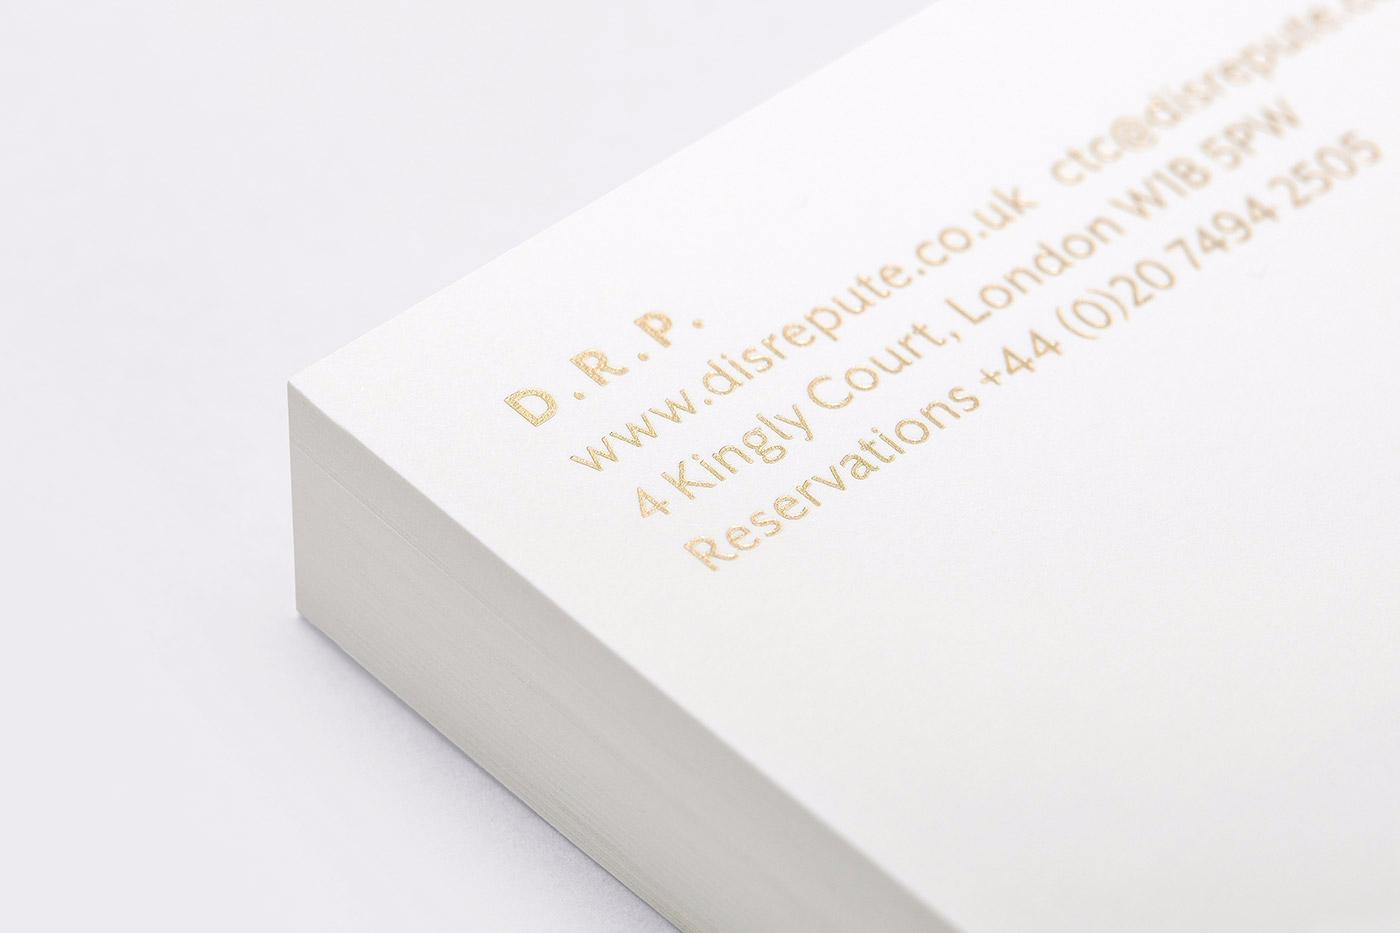 Disrepute Times Elliott - design - dailydesigner | ello